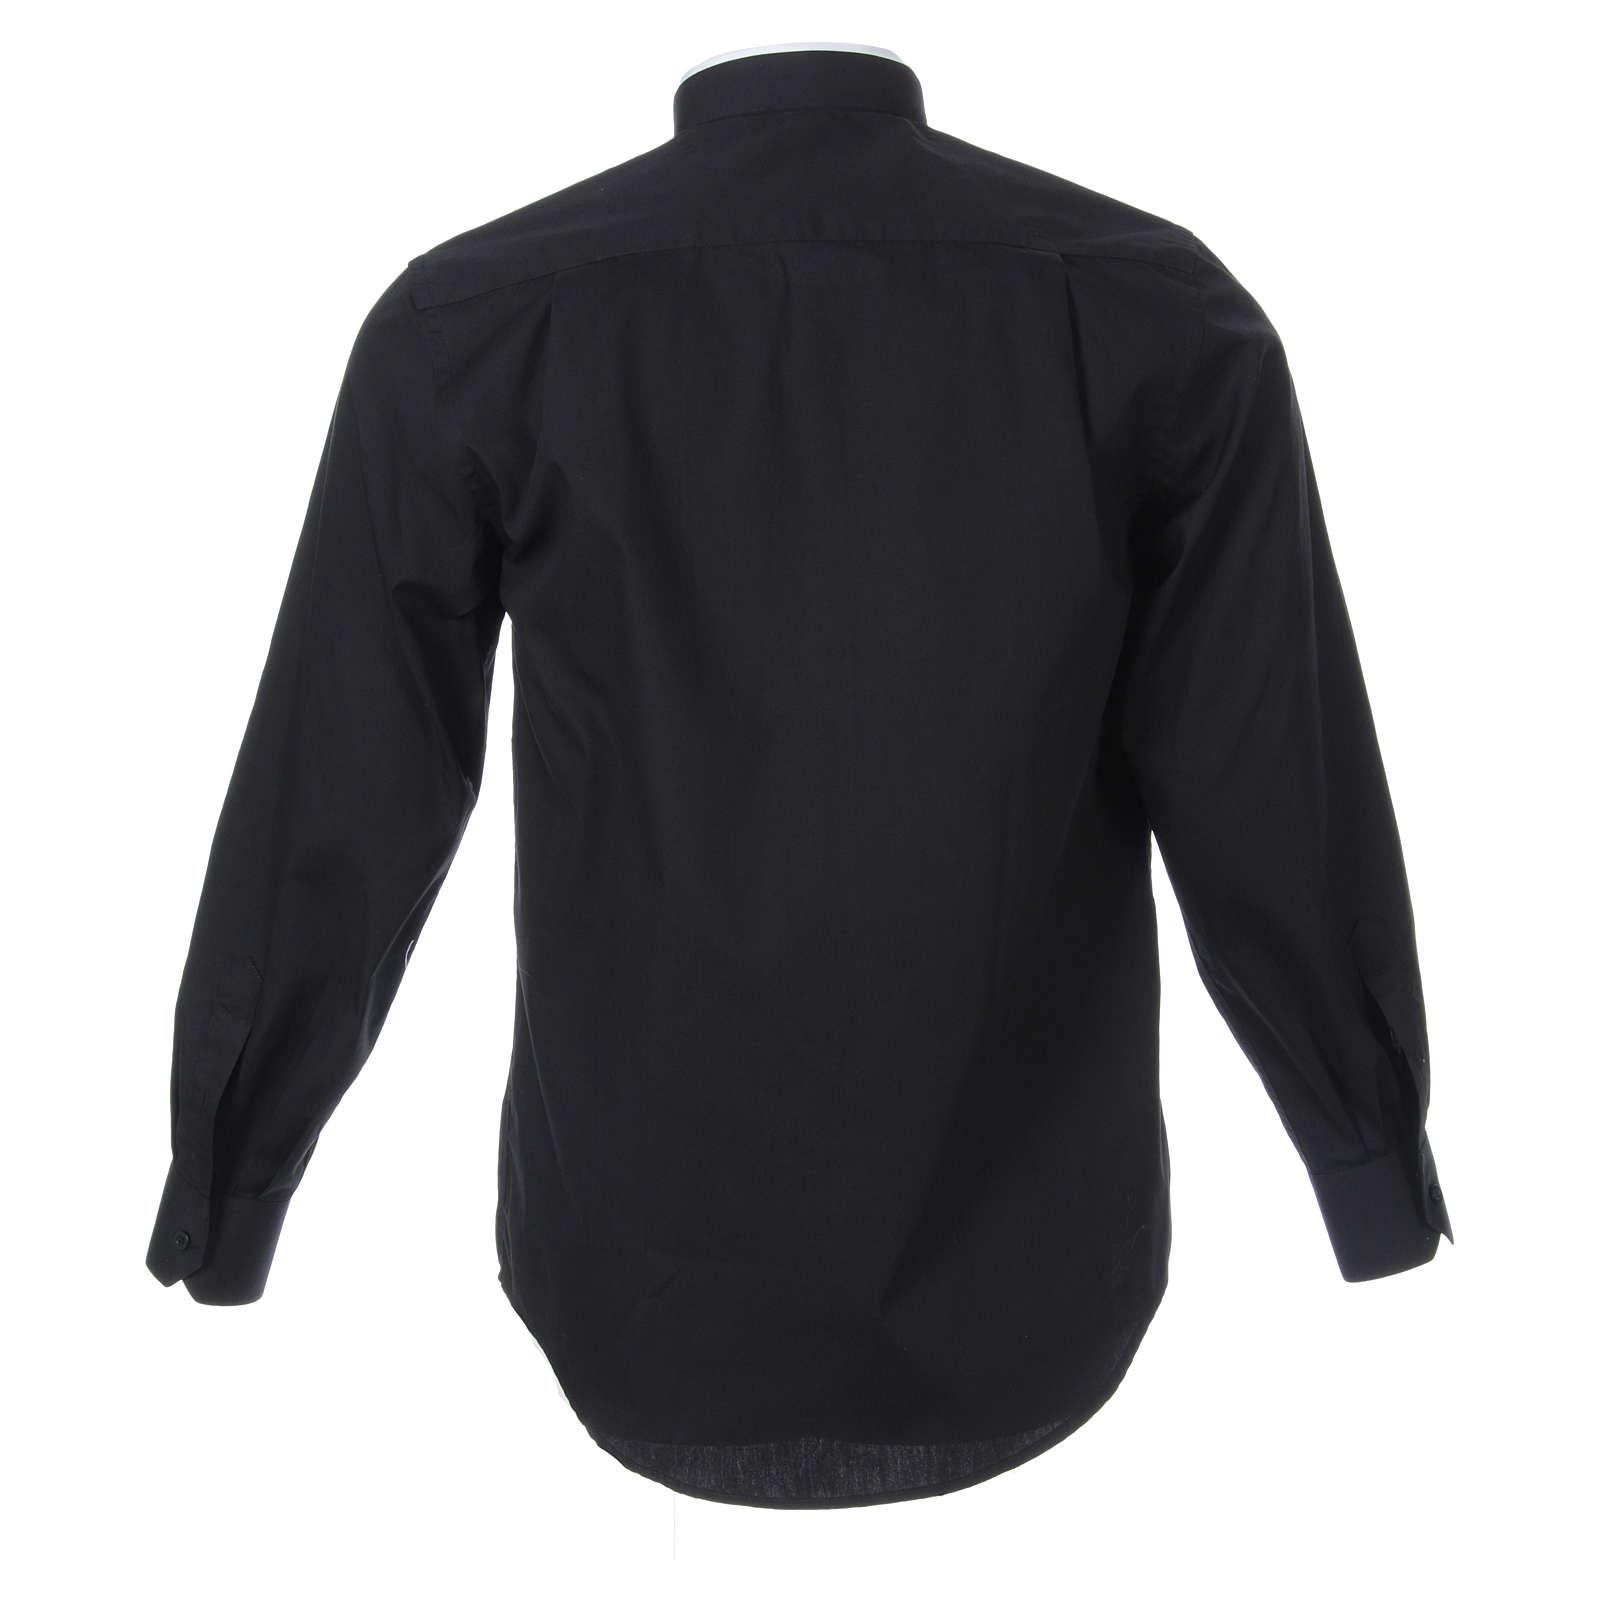 Camisa misto algodão colarinho romano manga longa preto 4